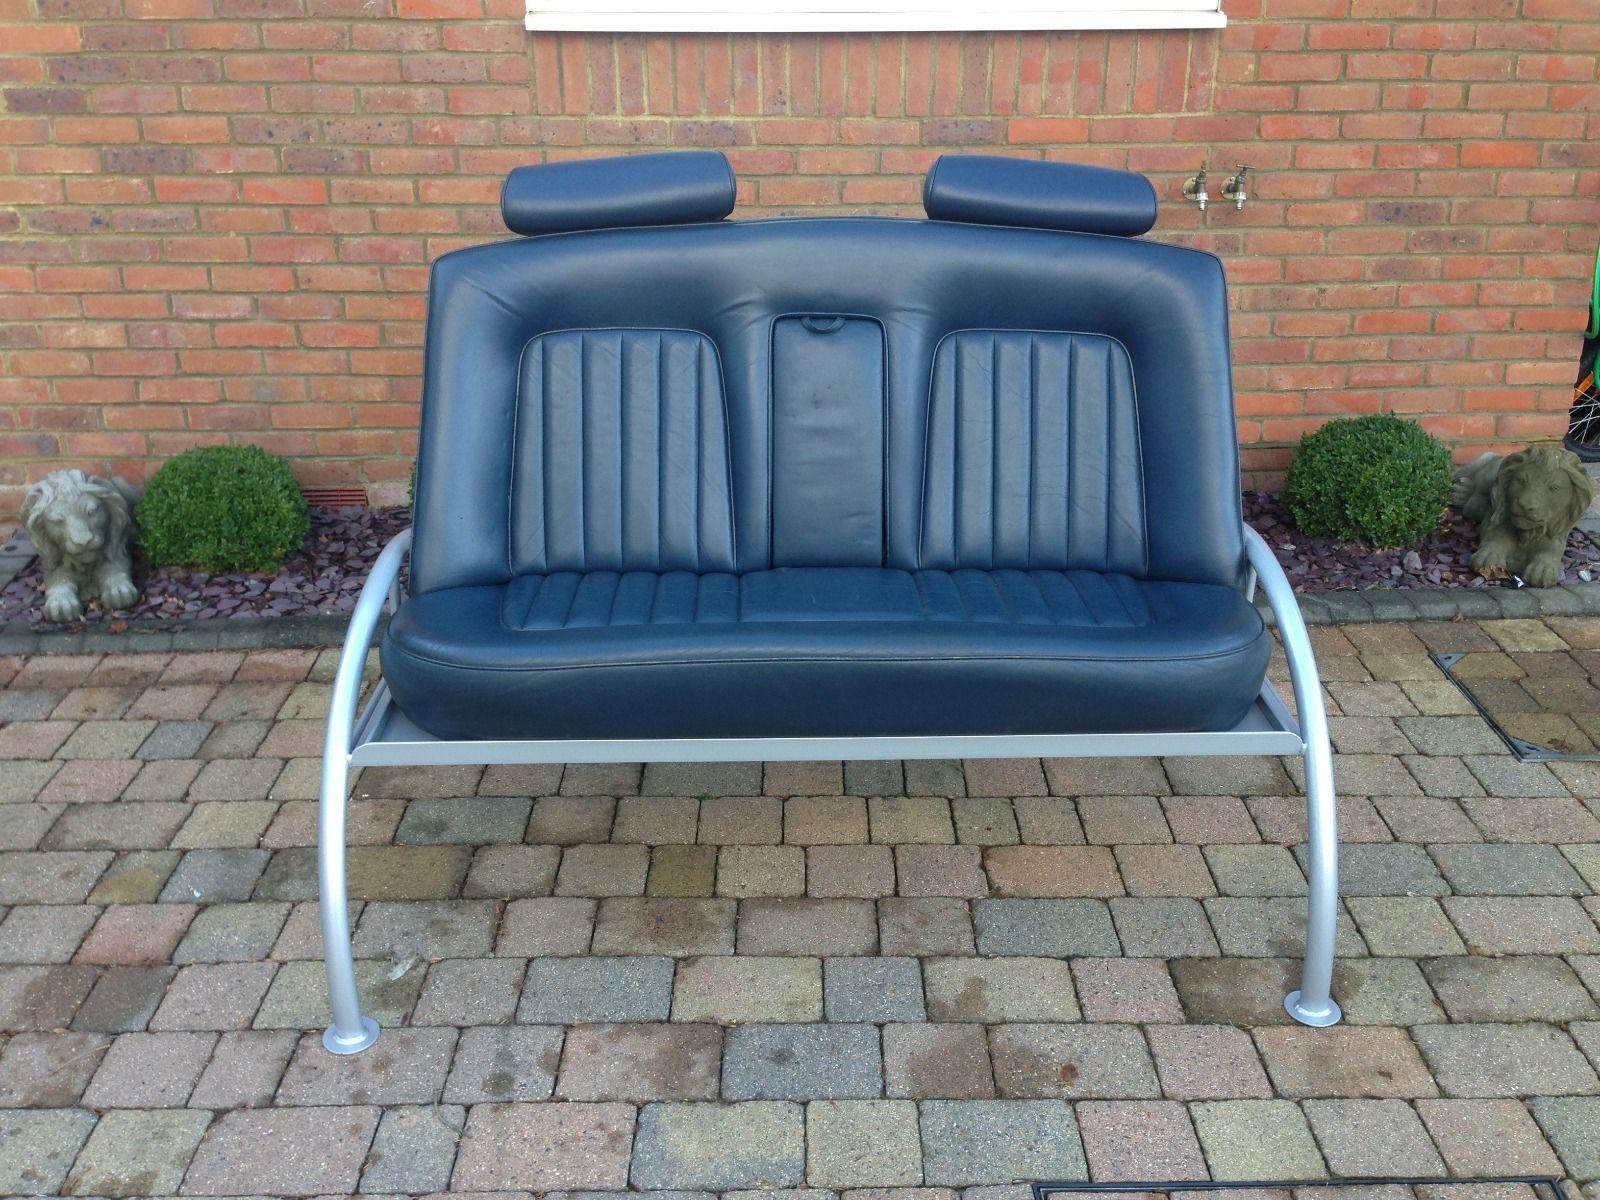 Top Gear Sofa/Seat/Chair Classic Car Showroom Or Mancave Rolls Royce  Clarkson In Home, Furniture U0026 DIY, Furniture, Sofas, Armchairs U0026 Suites